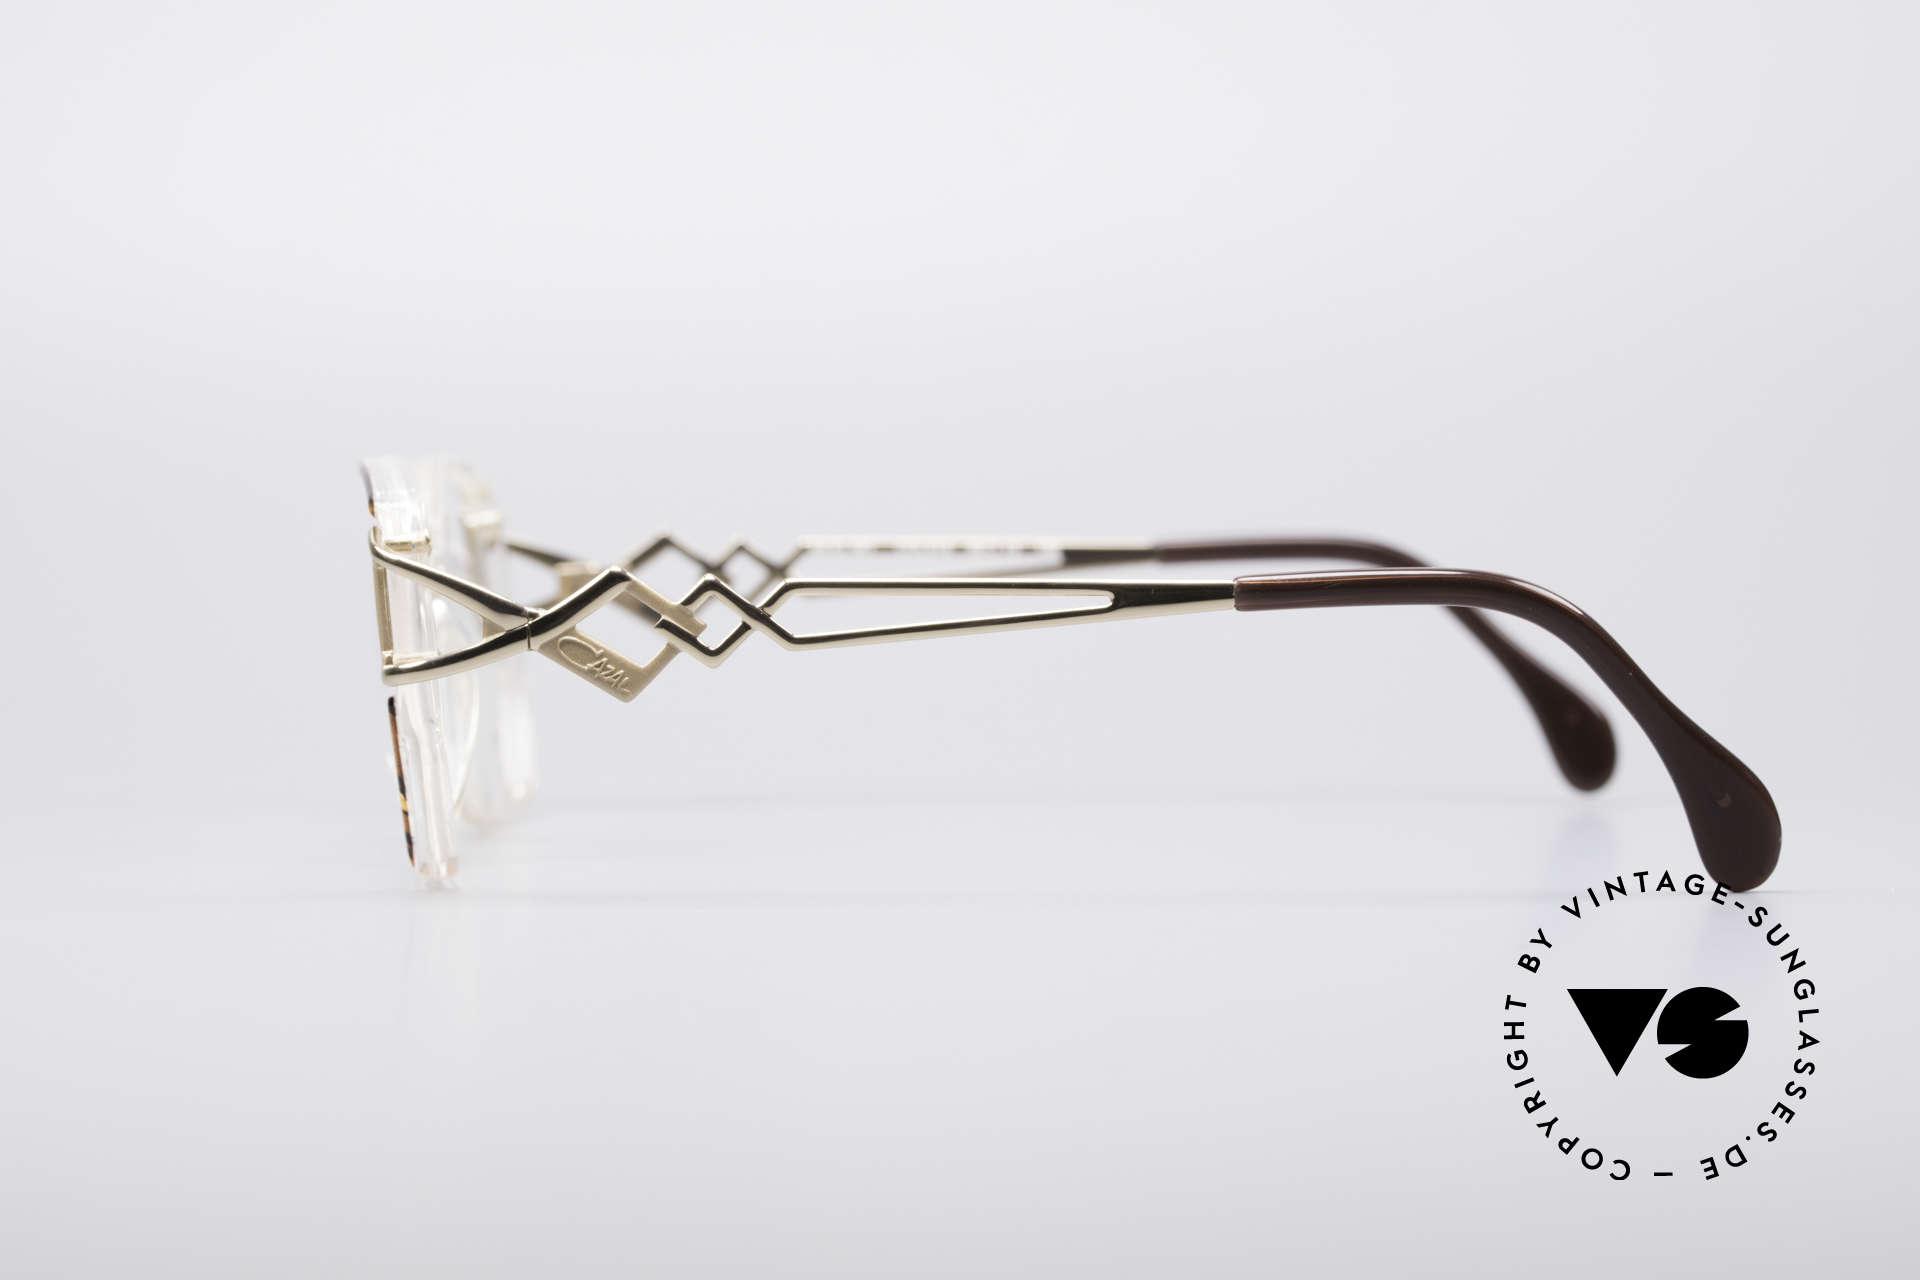 Cazal 367 90's Vintage Frame No Retro, new old stock (like all our rare vintage Cazal eyewear), Made for Women